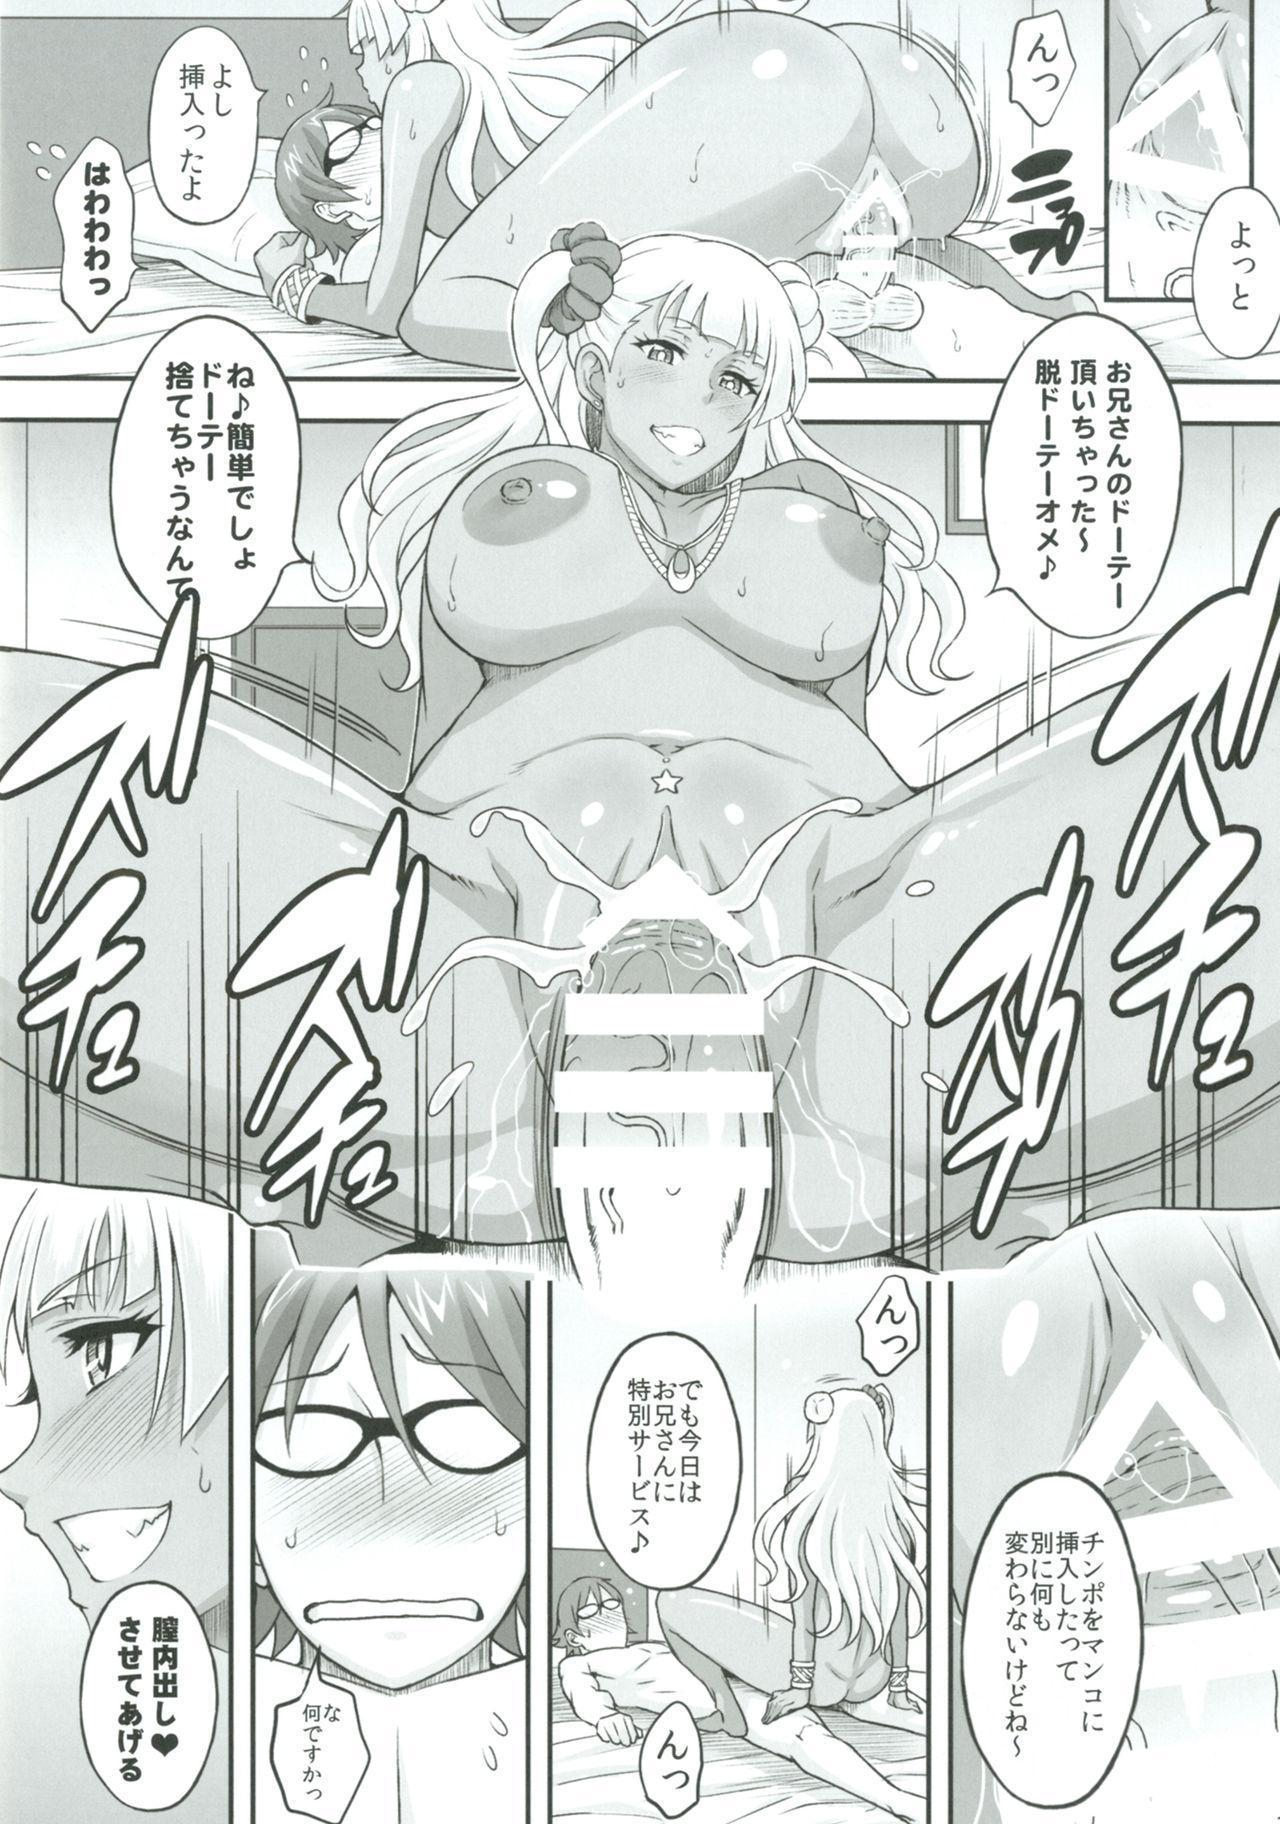 Omakase Fudeoroshi Galko-chan 2 9